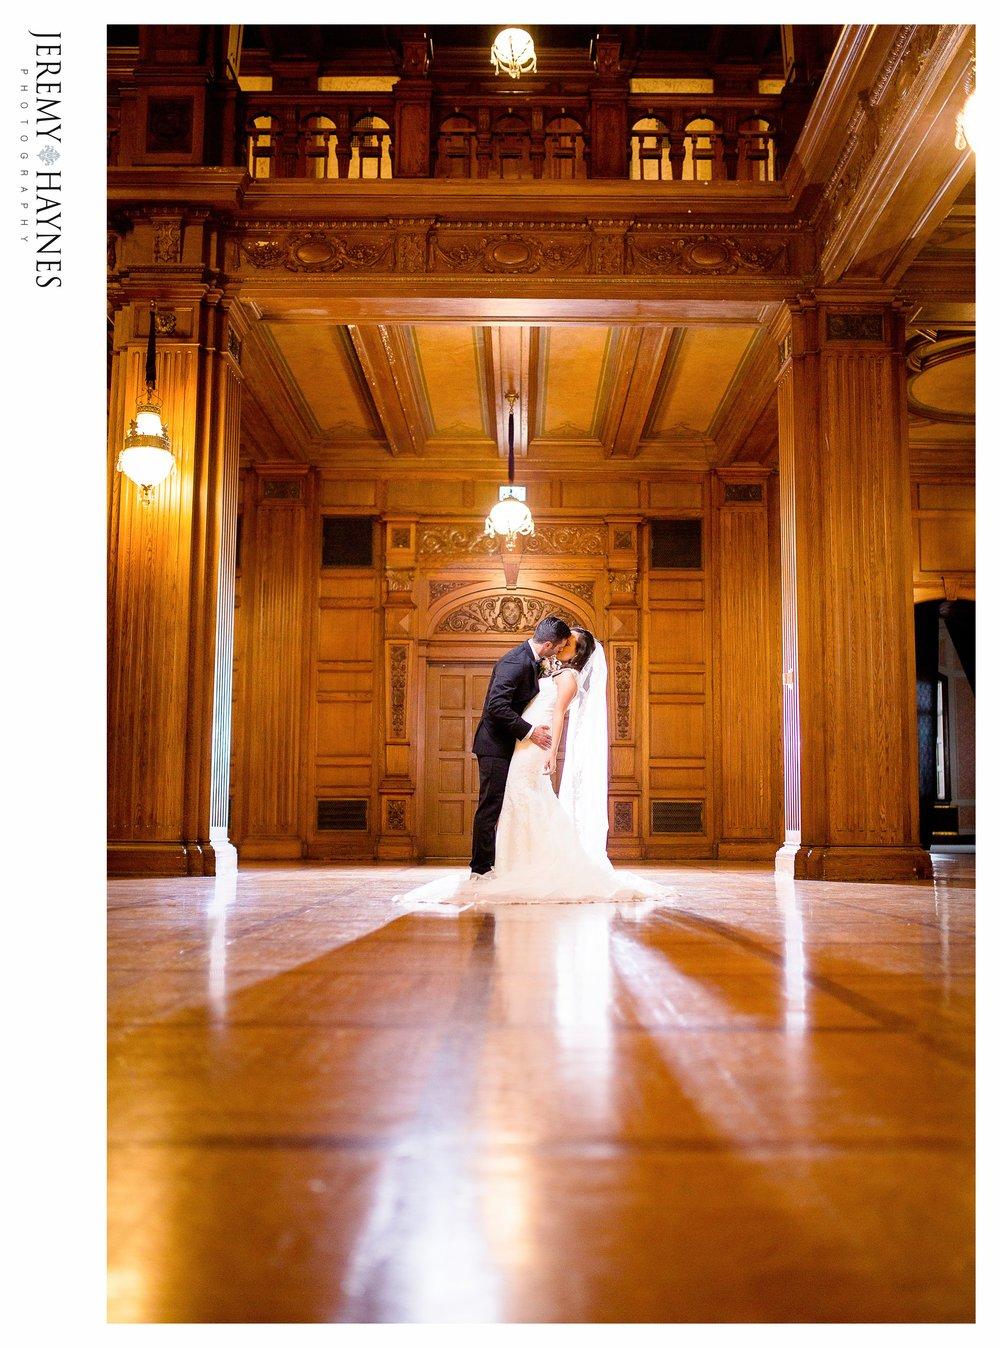 Laura and Jon Wedding 31.jpg